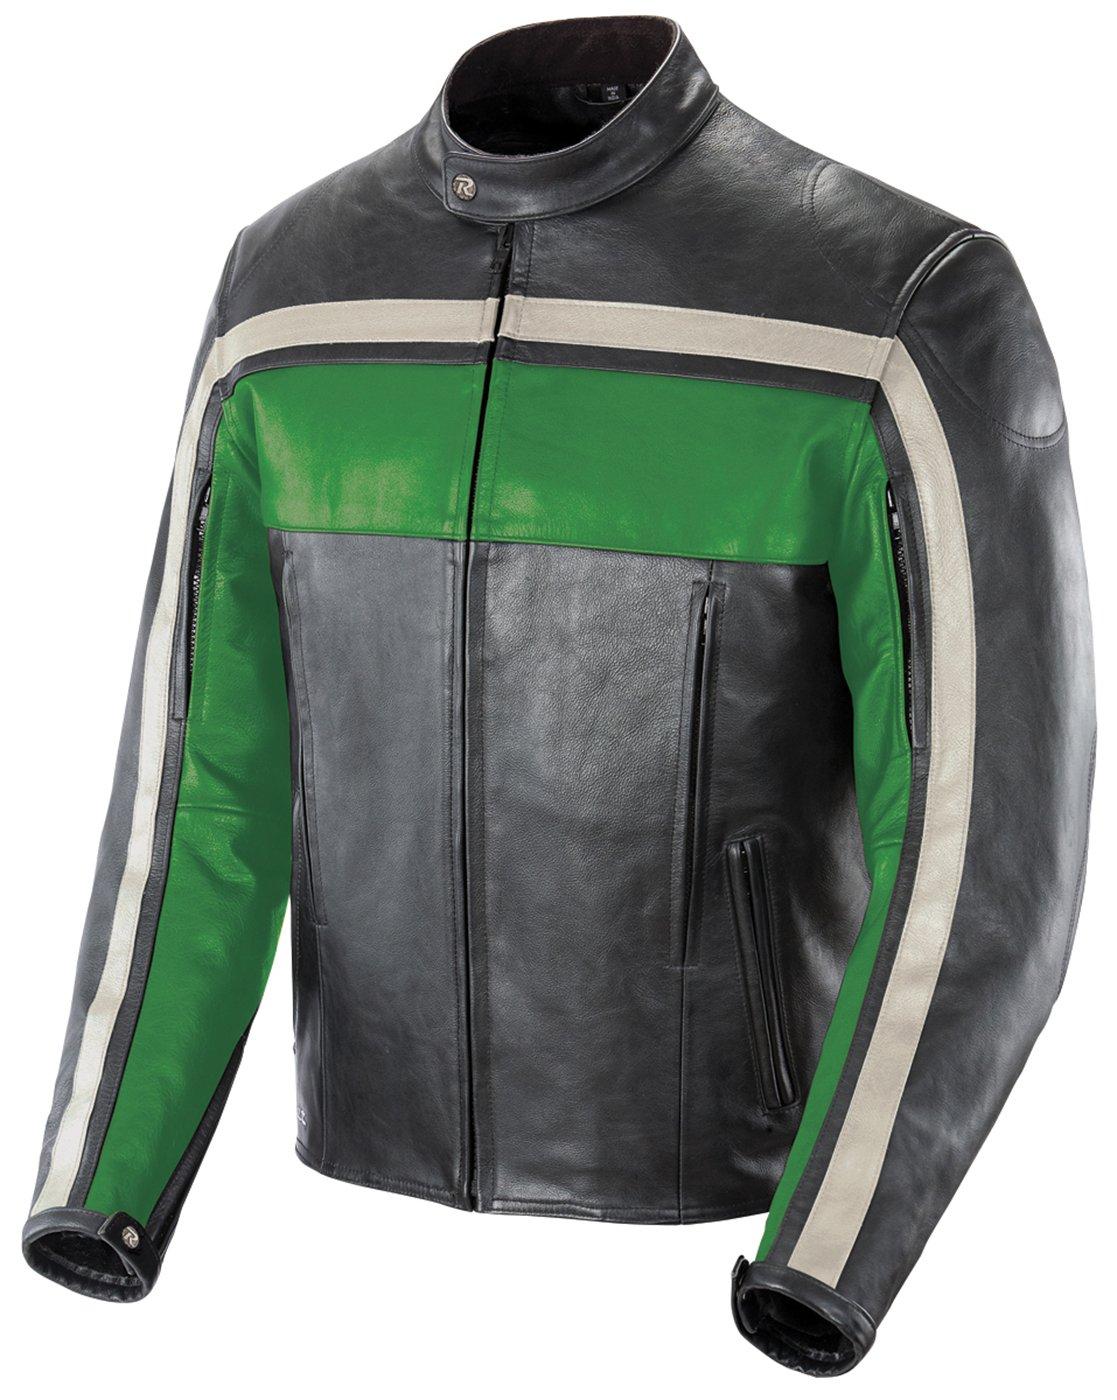 Amazon.com: Joe Rocket Old School Men's Leather Motorcycle Jacket ...